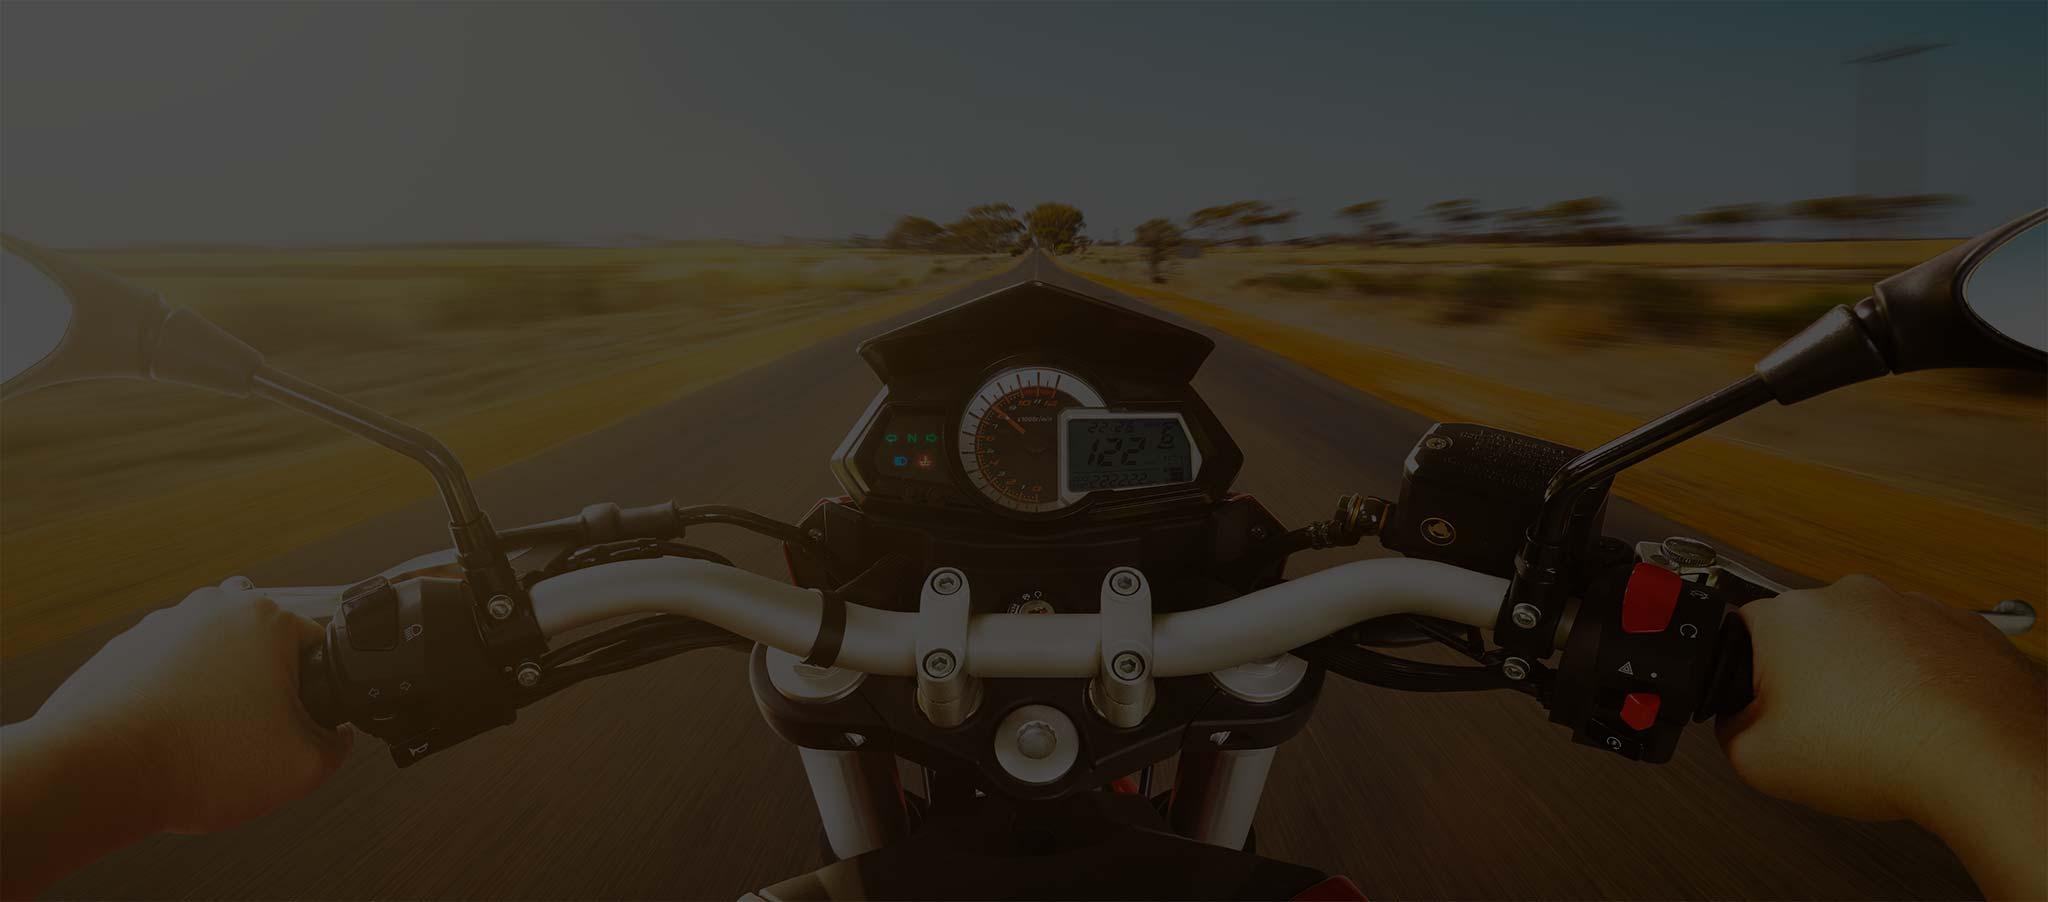 FAQs - Saddleback Rider Training